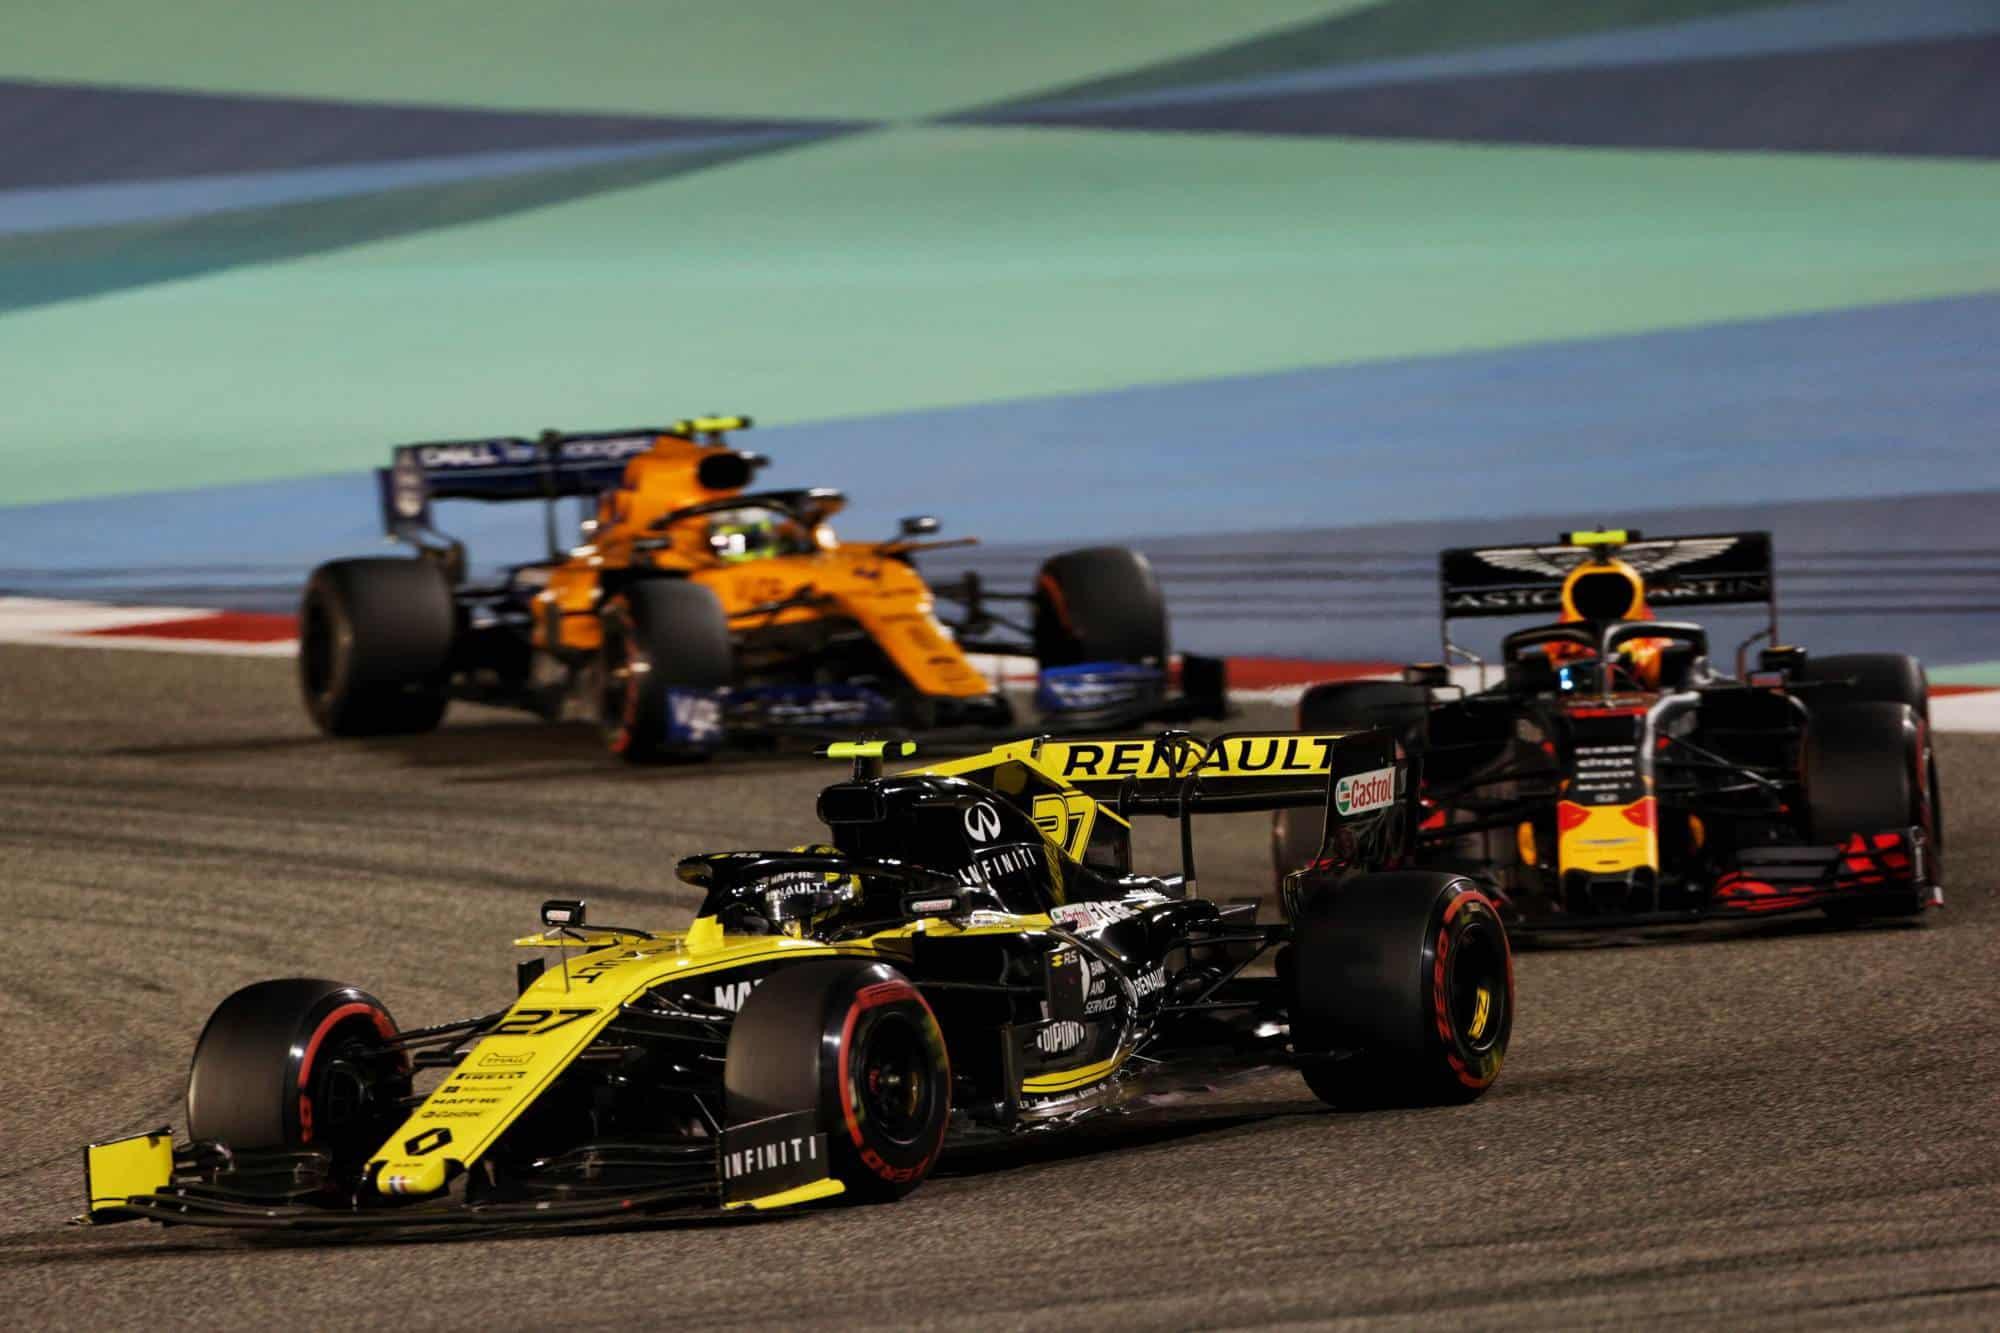 Hulkenberg leads Gasly and Norris Bahrain GP F1 2019 Photo Renault